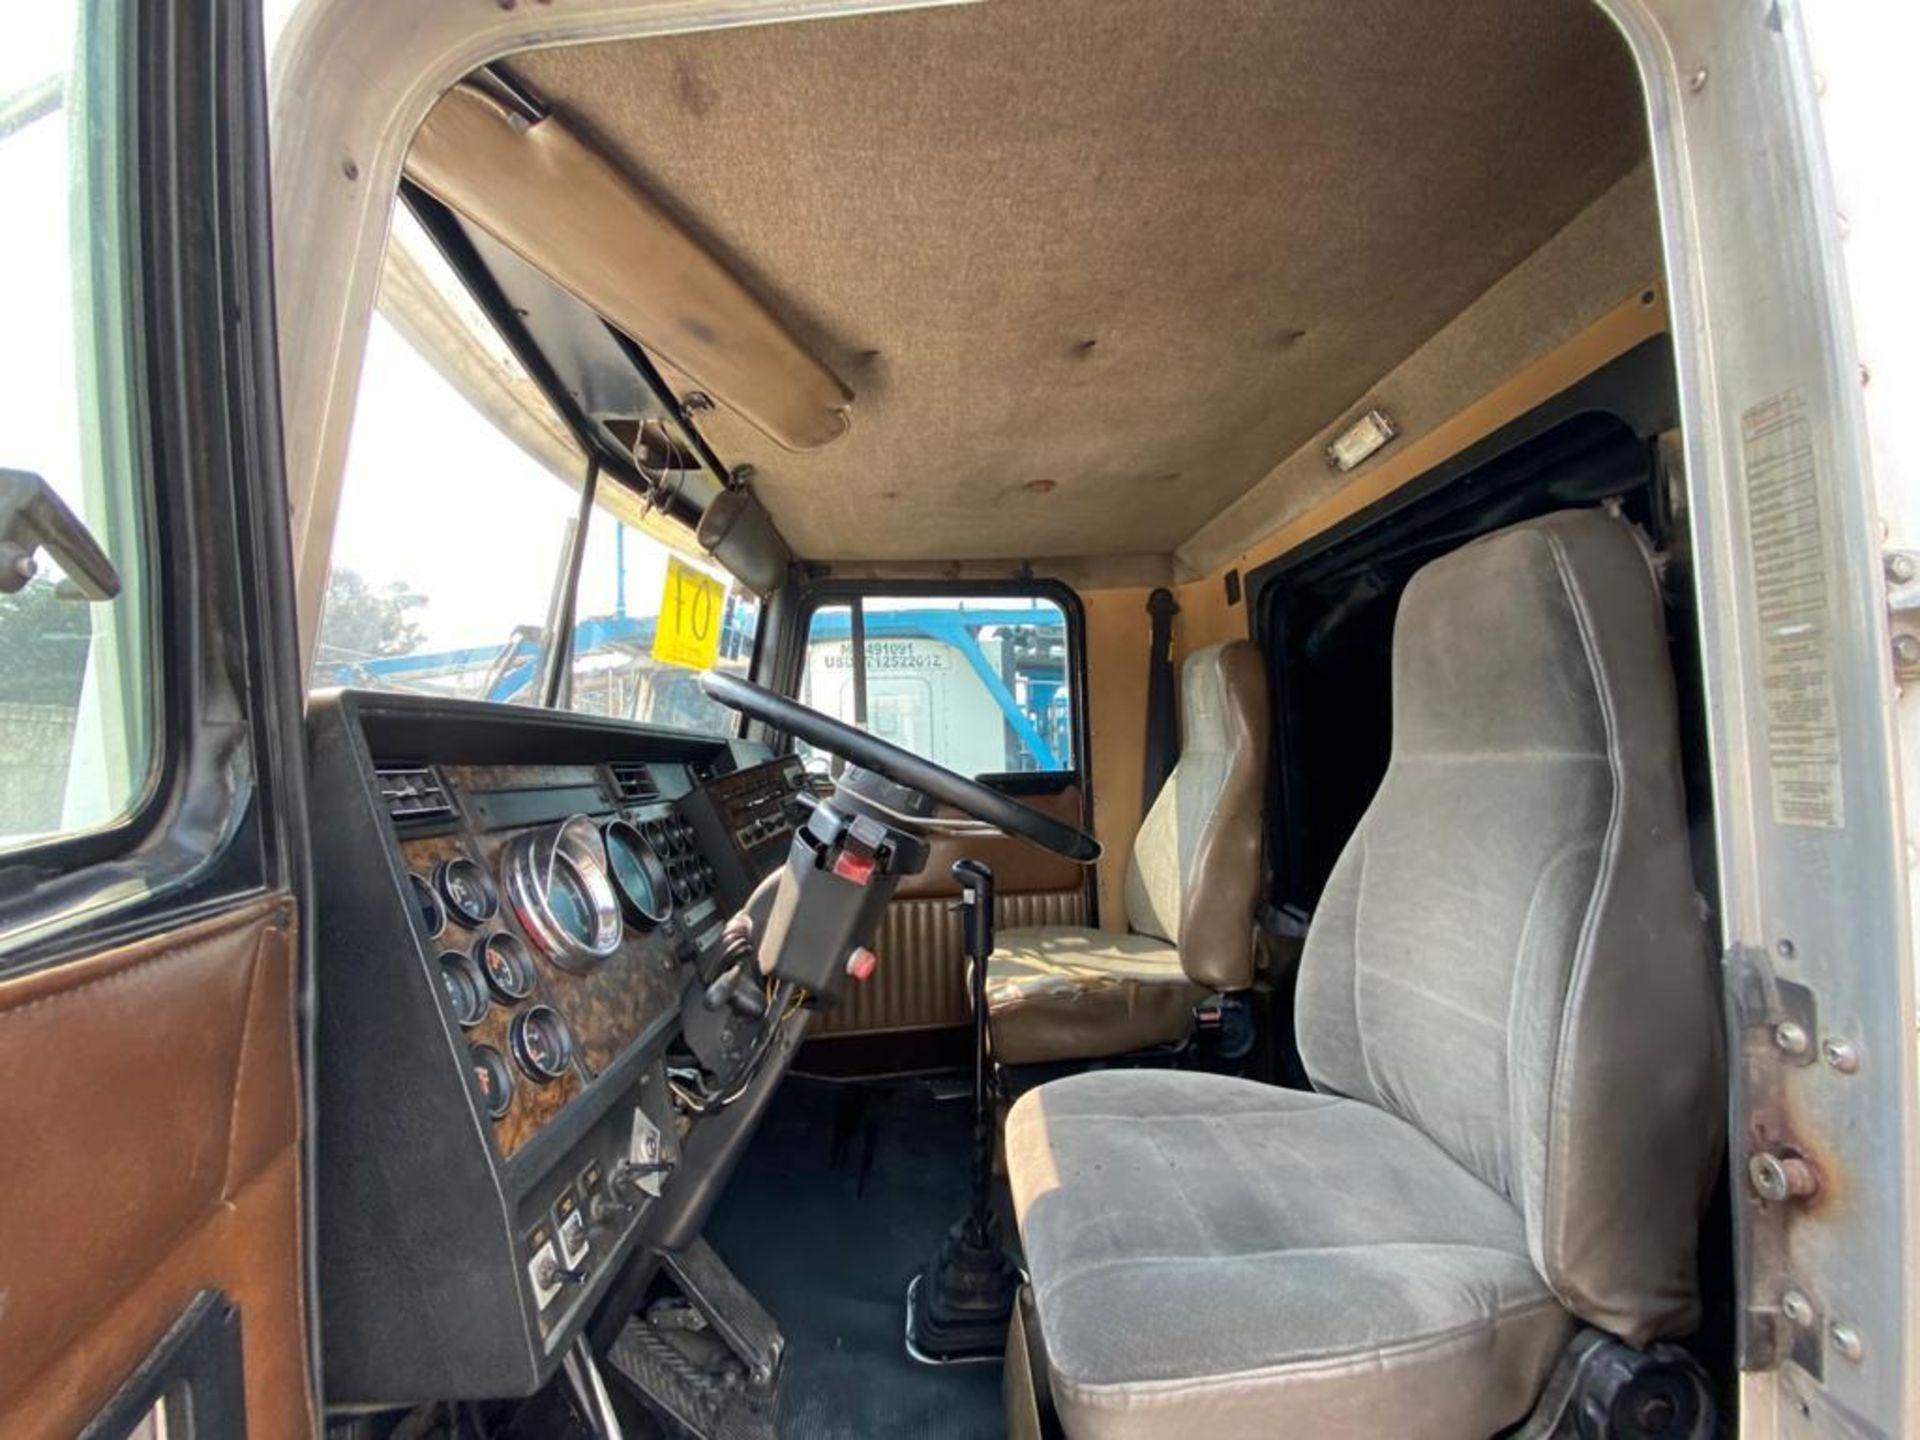 1999 Kenworth Sleeper truck tractor, standard transmission of 18 speeds - Image 28 of 72